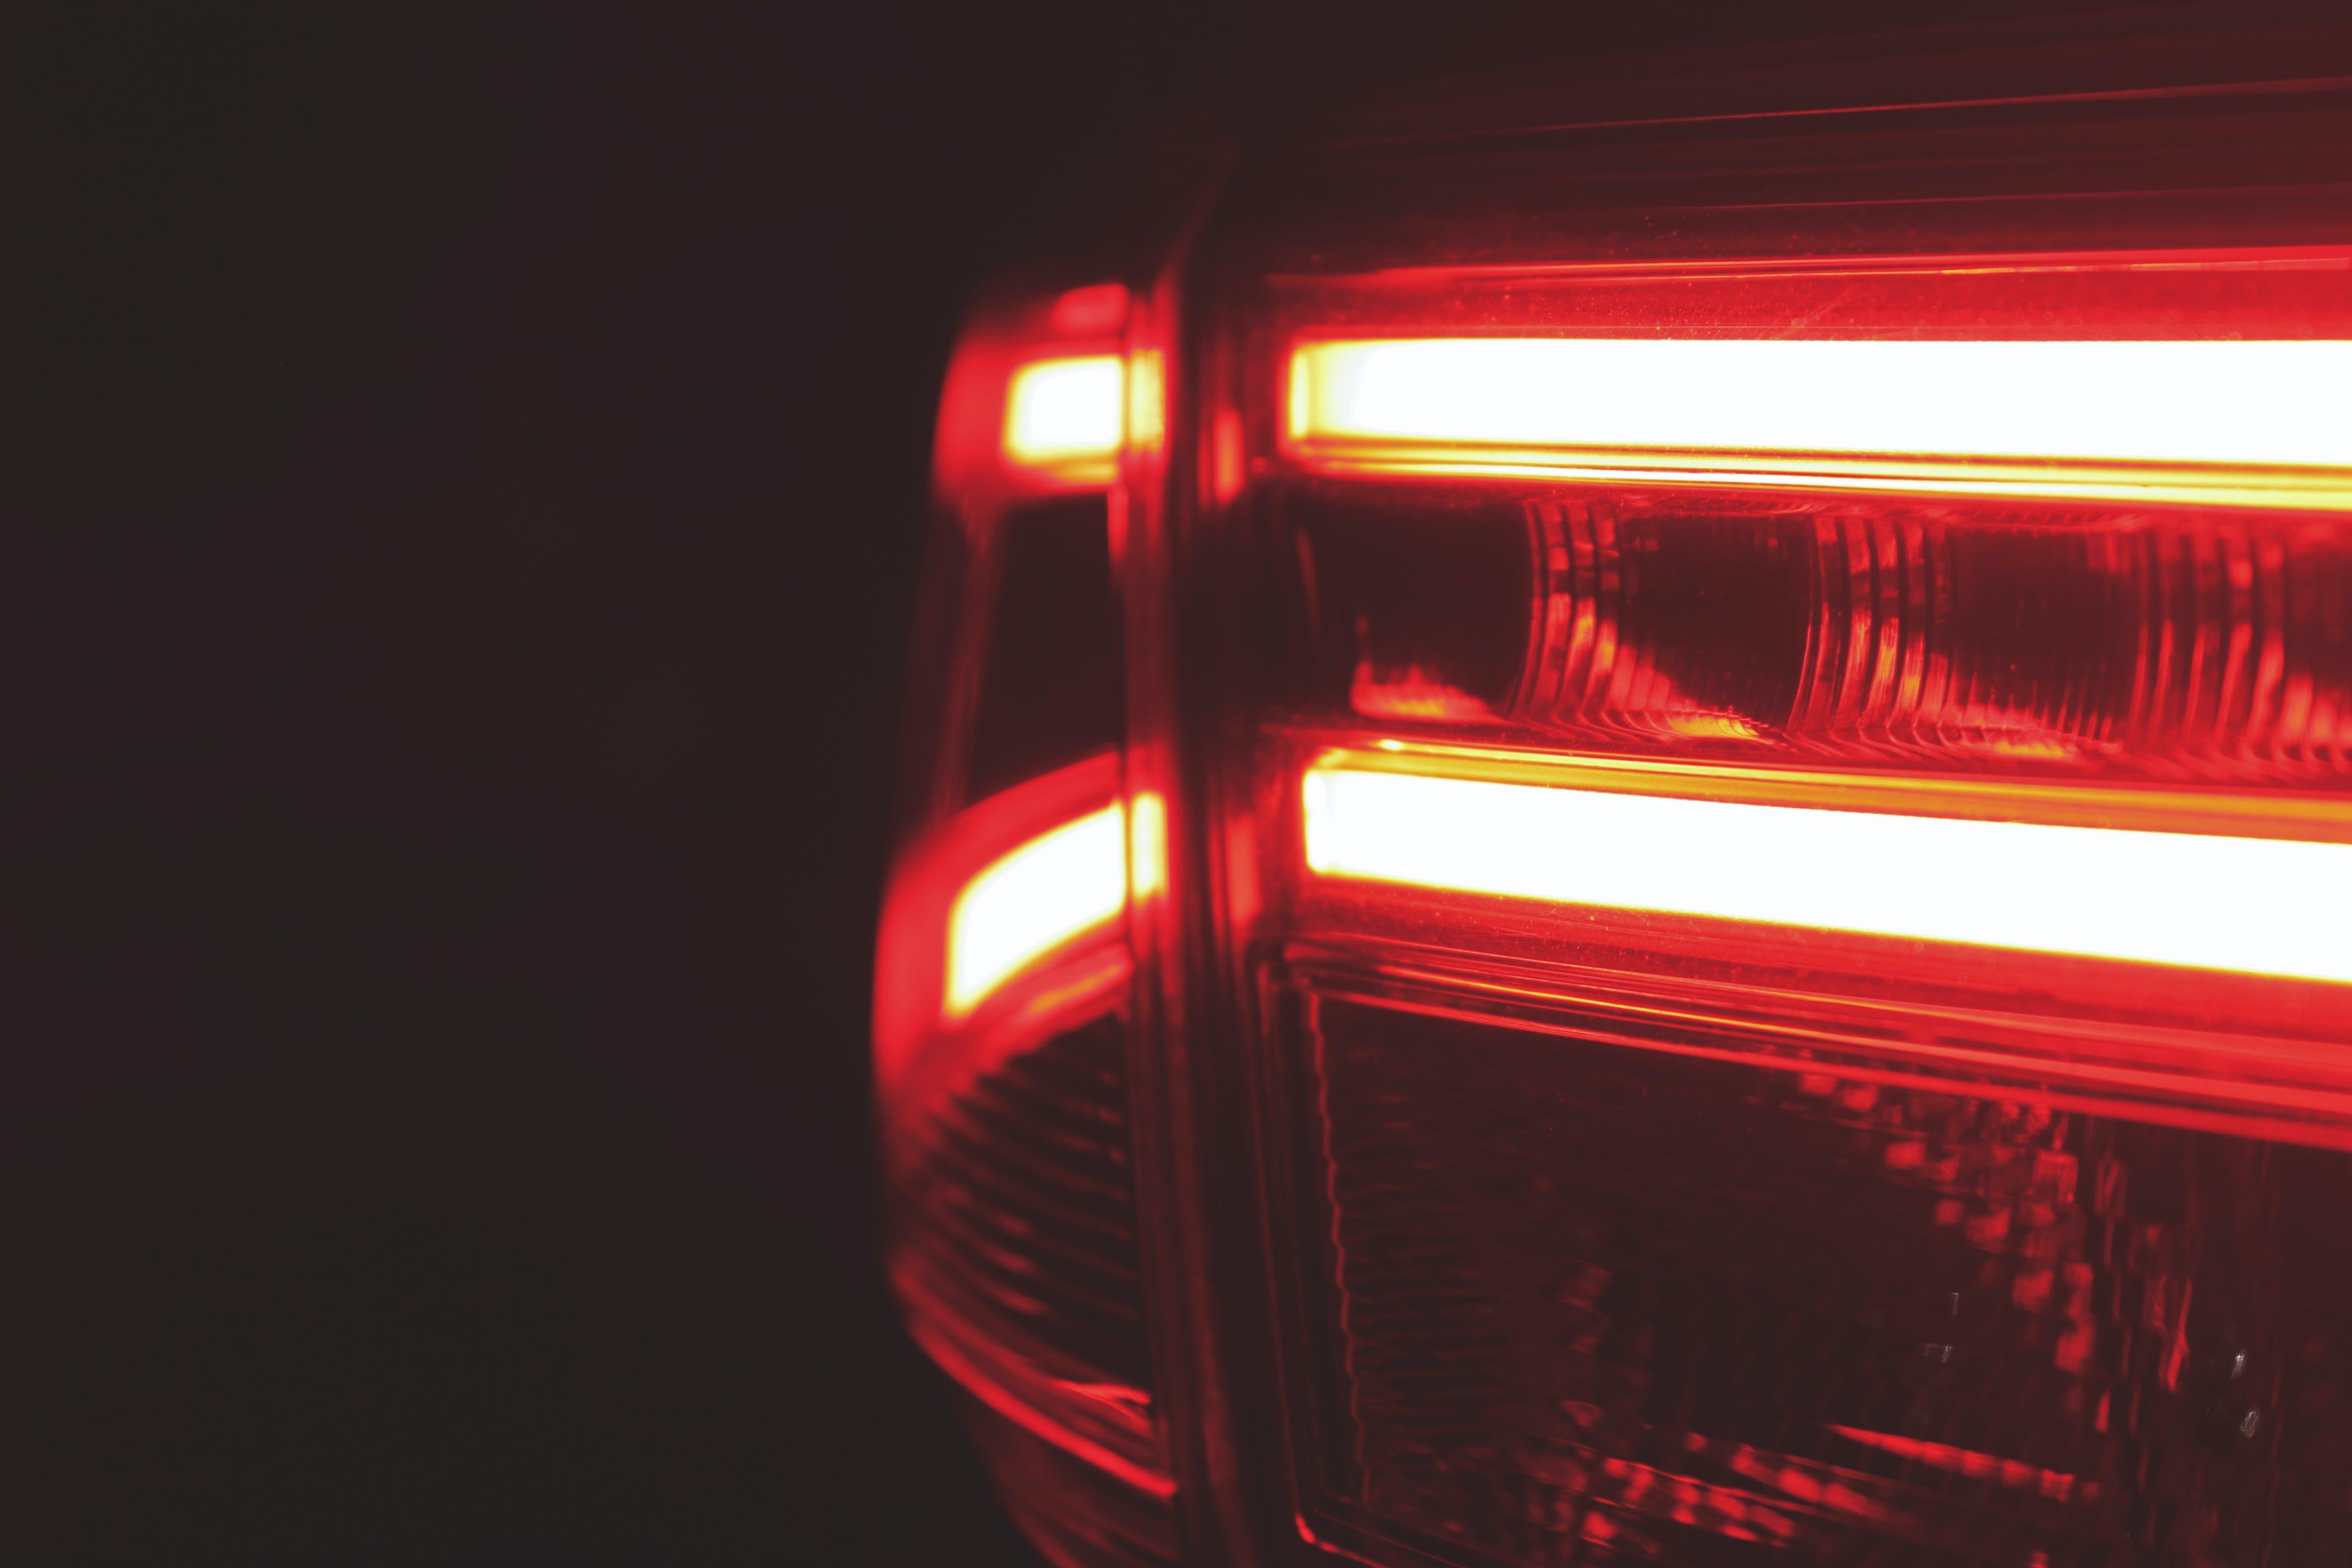 auto, back light, red light